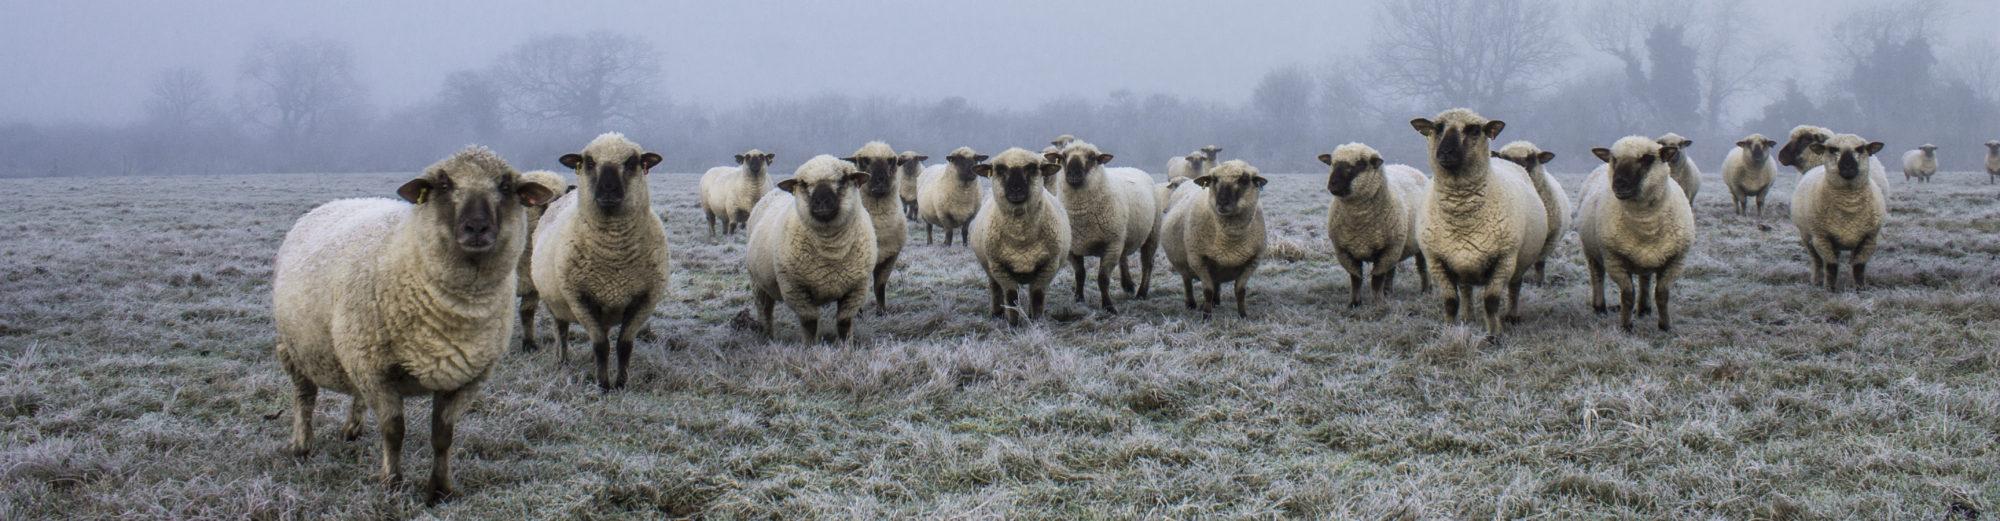 Dorset Down Sheep Breeders